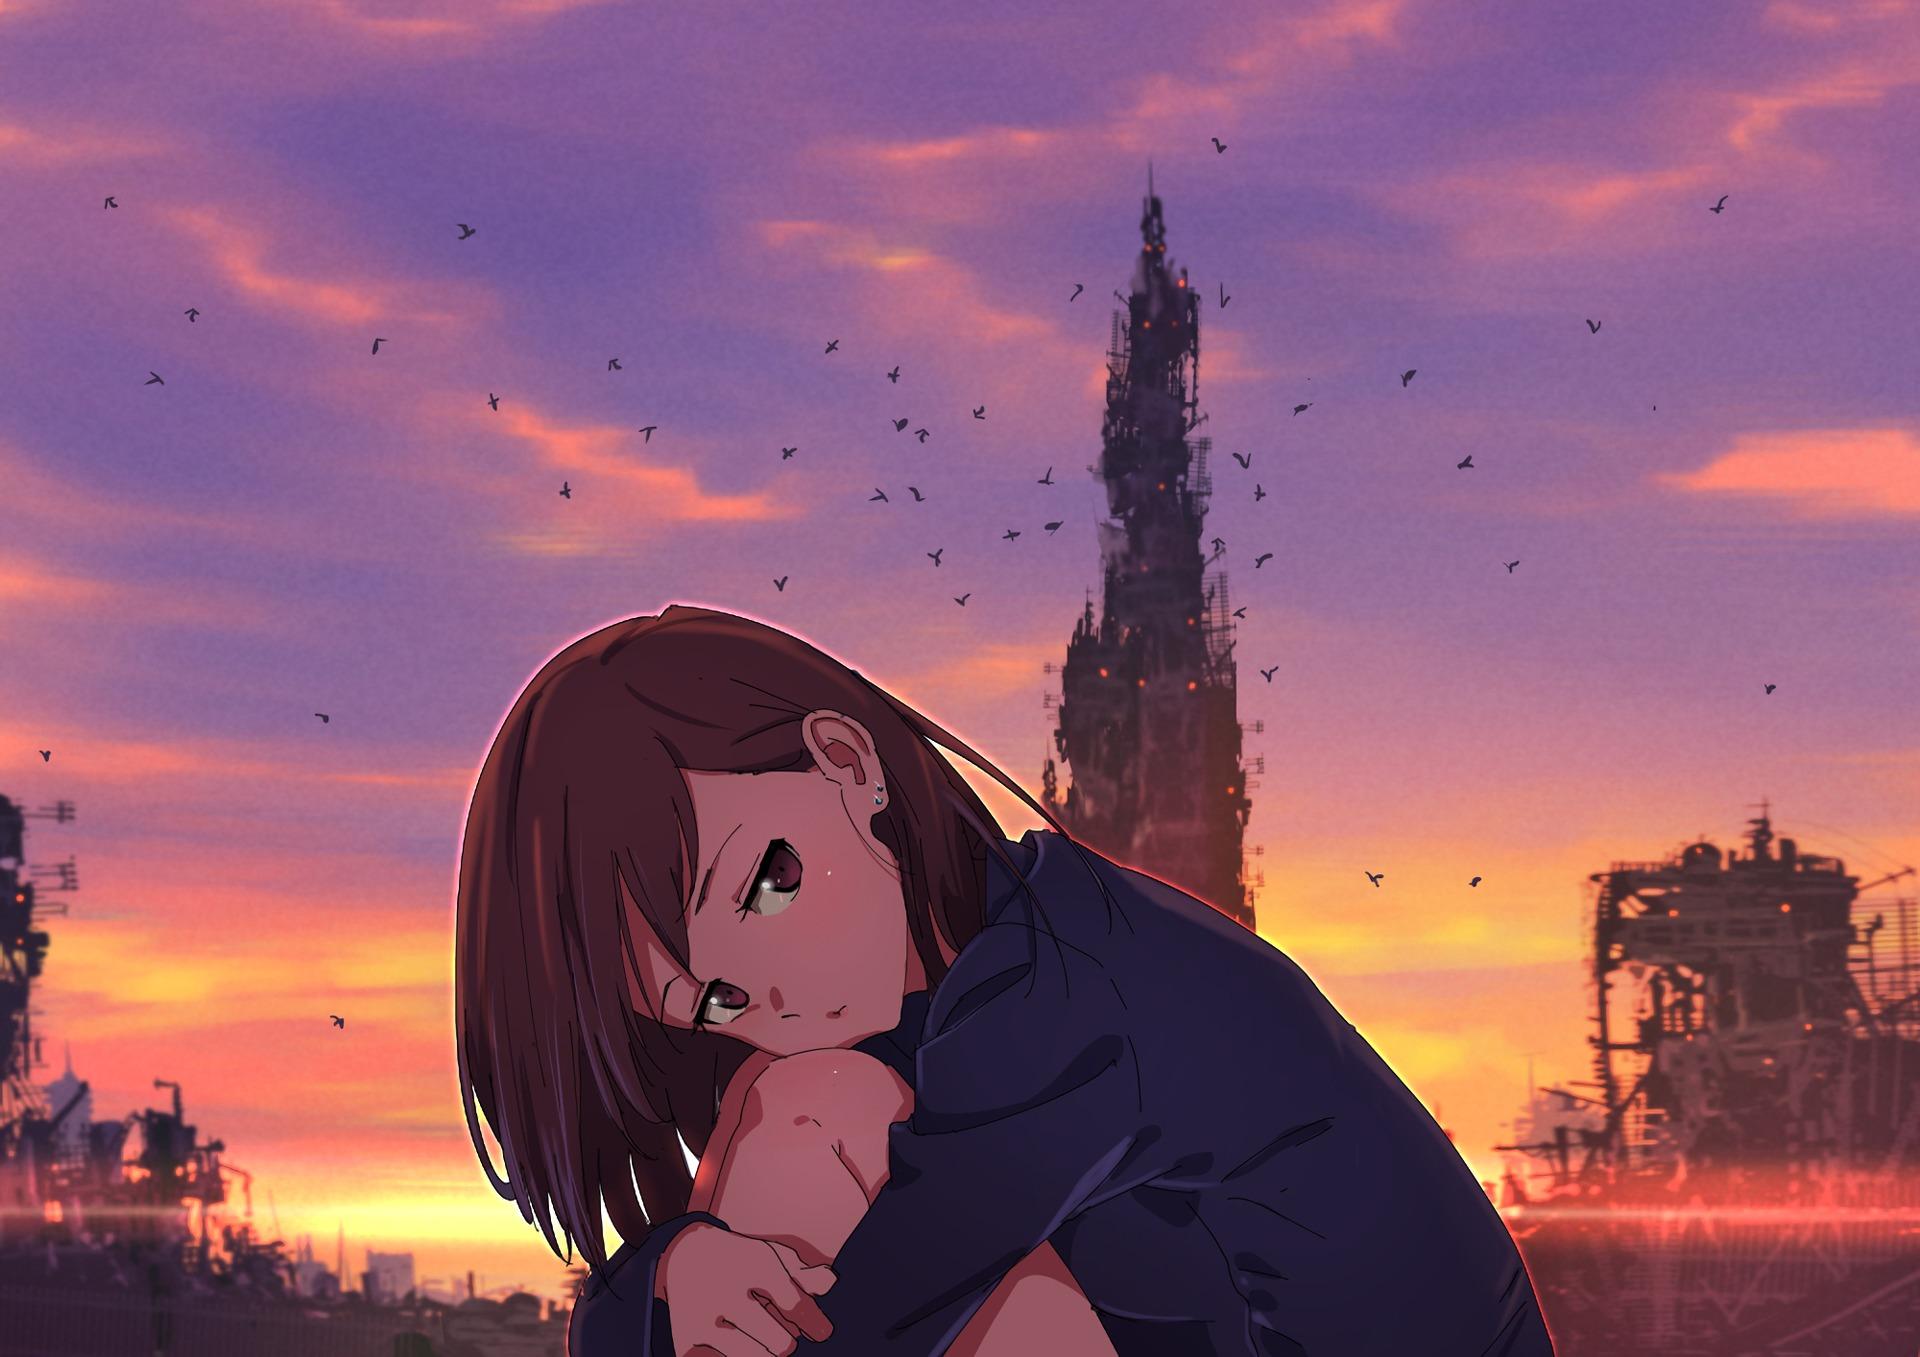 Download Broken Heart Anime Girl 480x854 Resolution Full HD Wallpaper